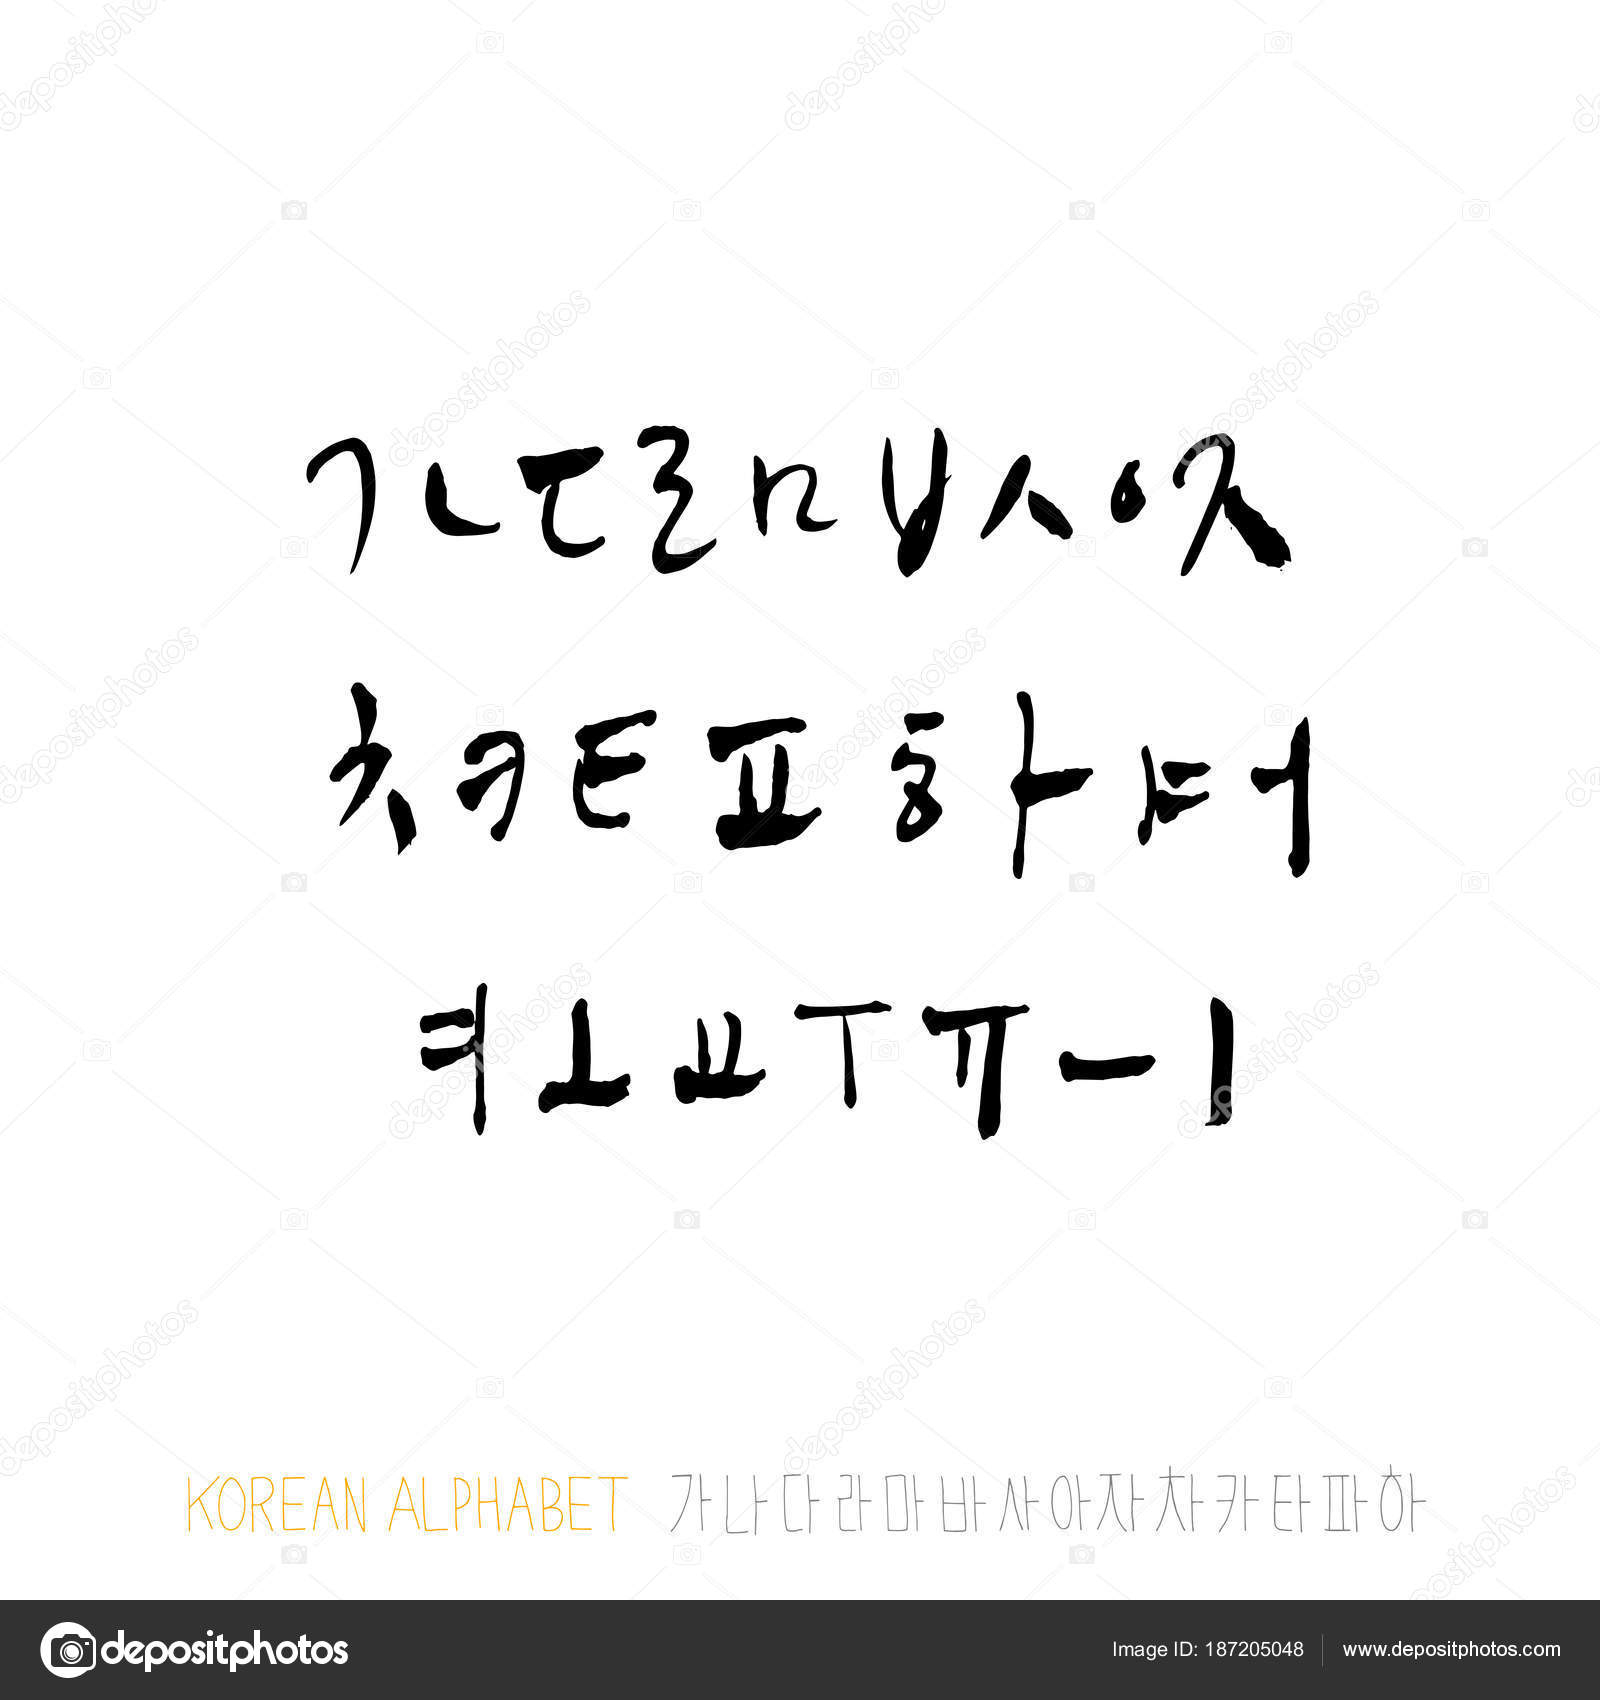 Korean Alphabet / Handwritten Calligraphy 187205048